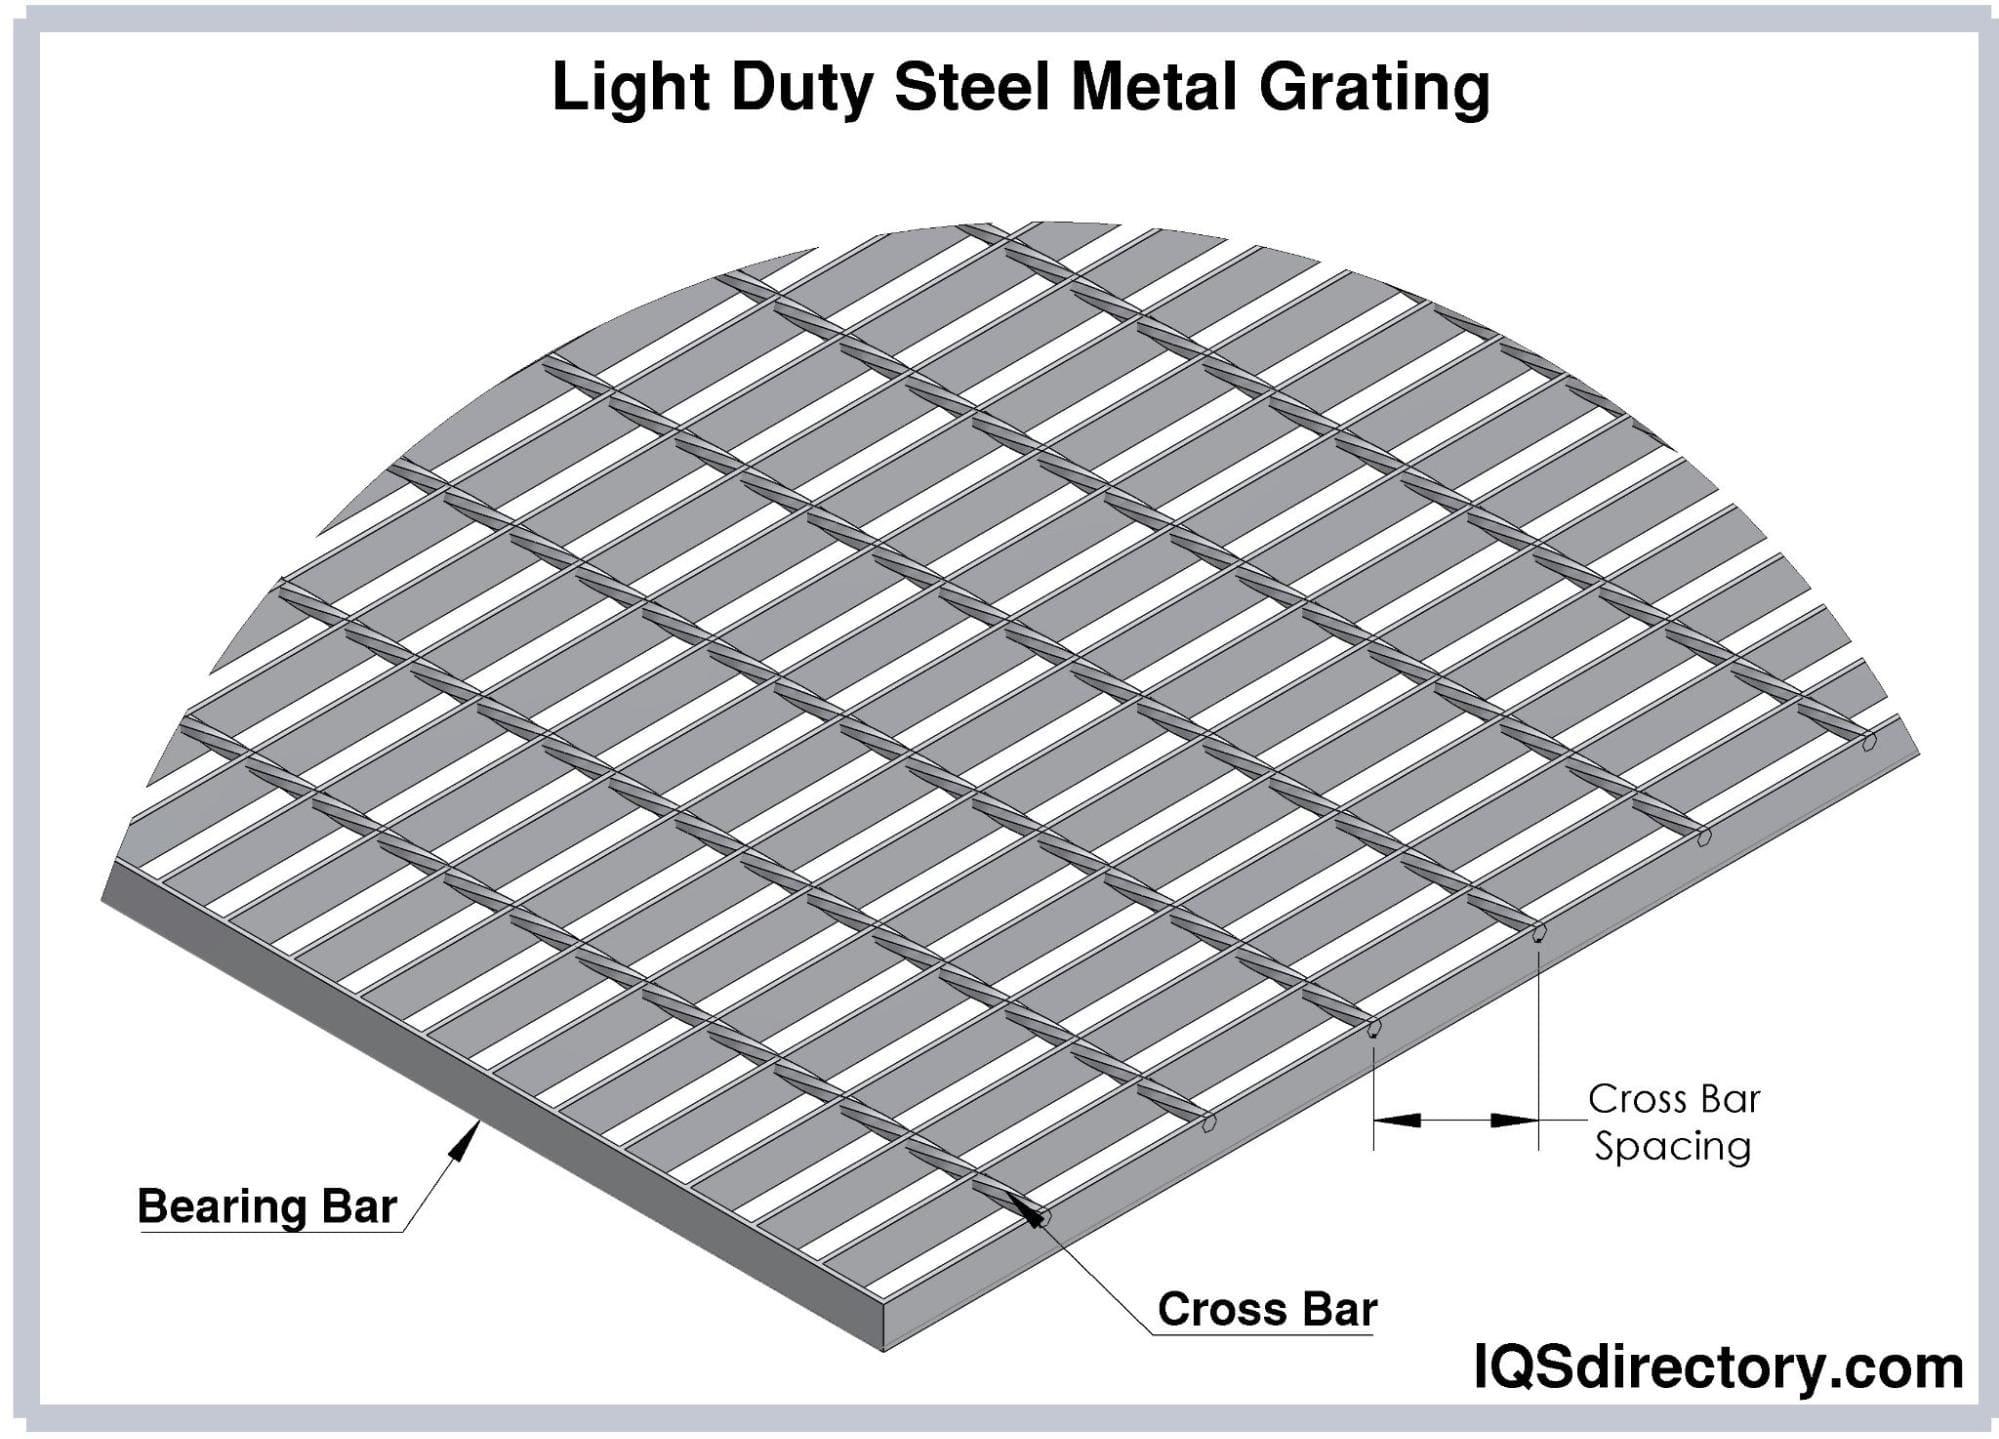 Light Duty Steel Metal Grating